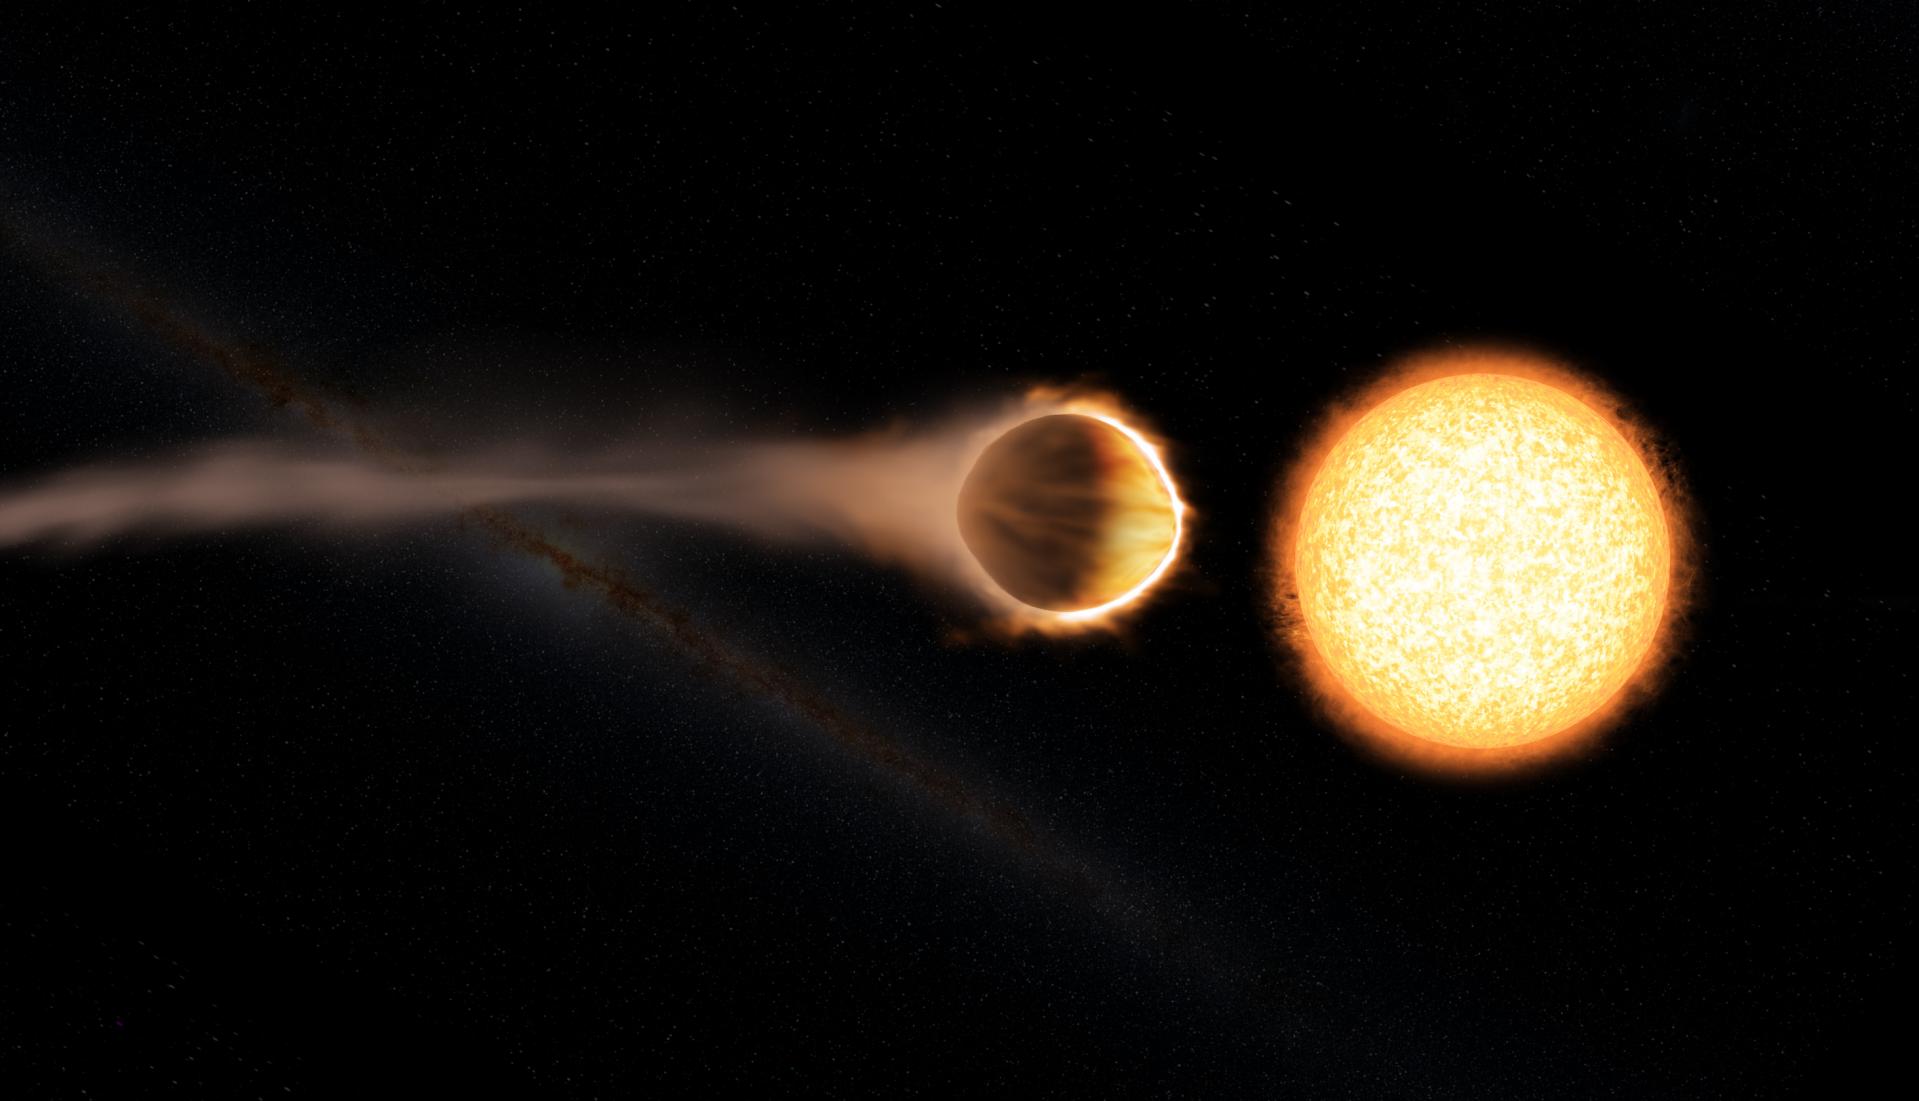 Hubble Telescope detects stratosphere on huge alien planet